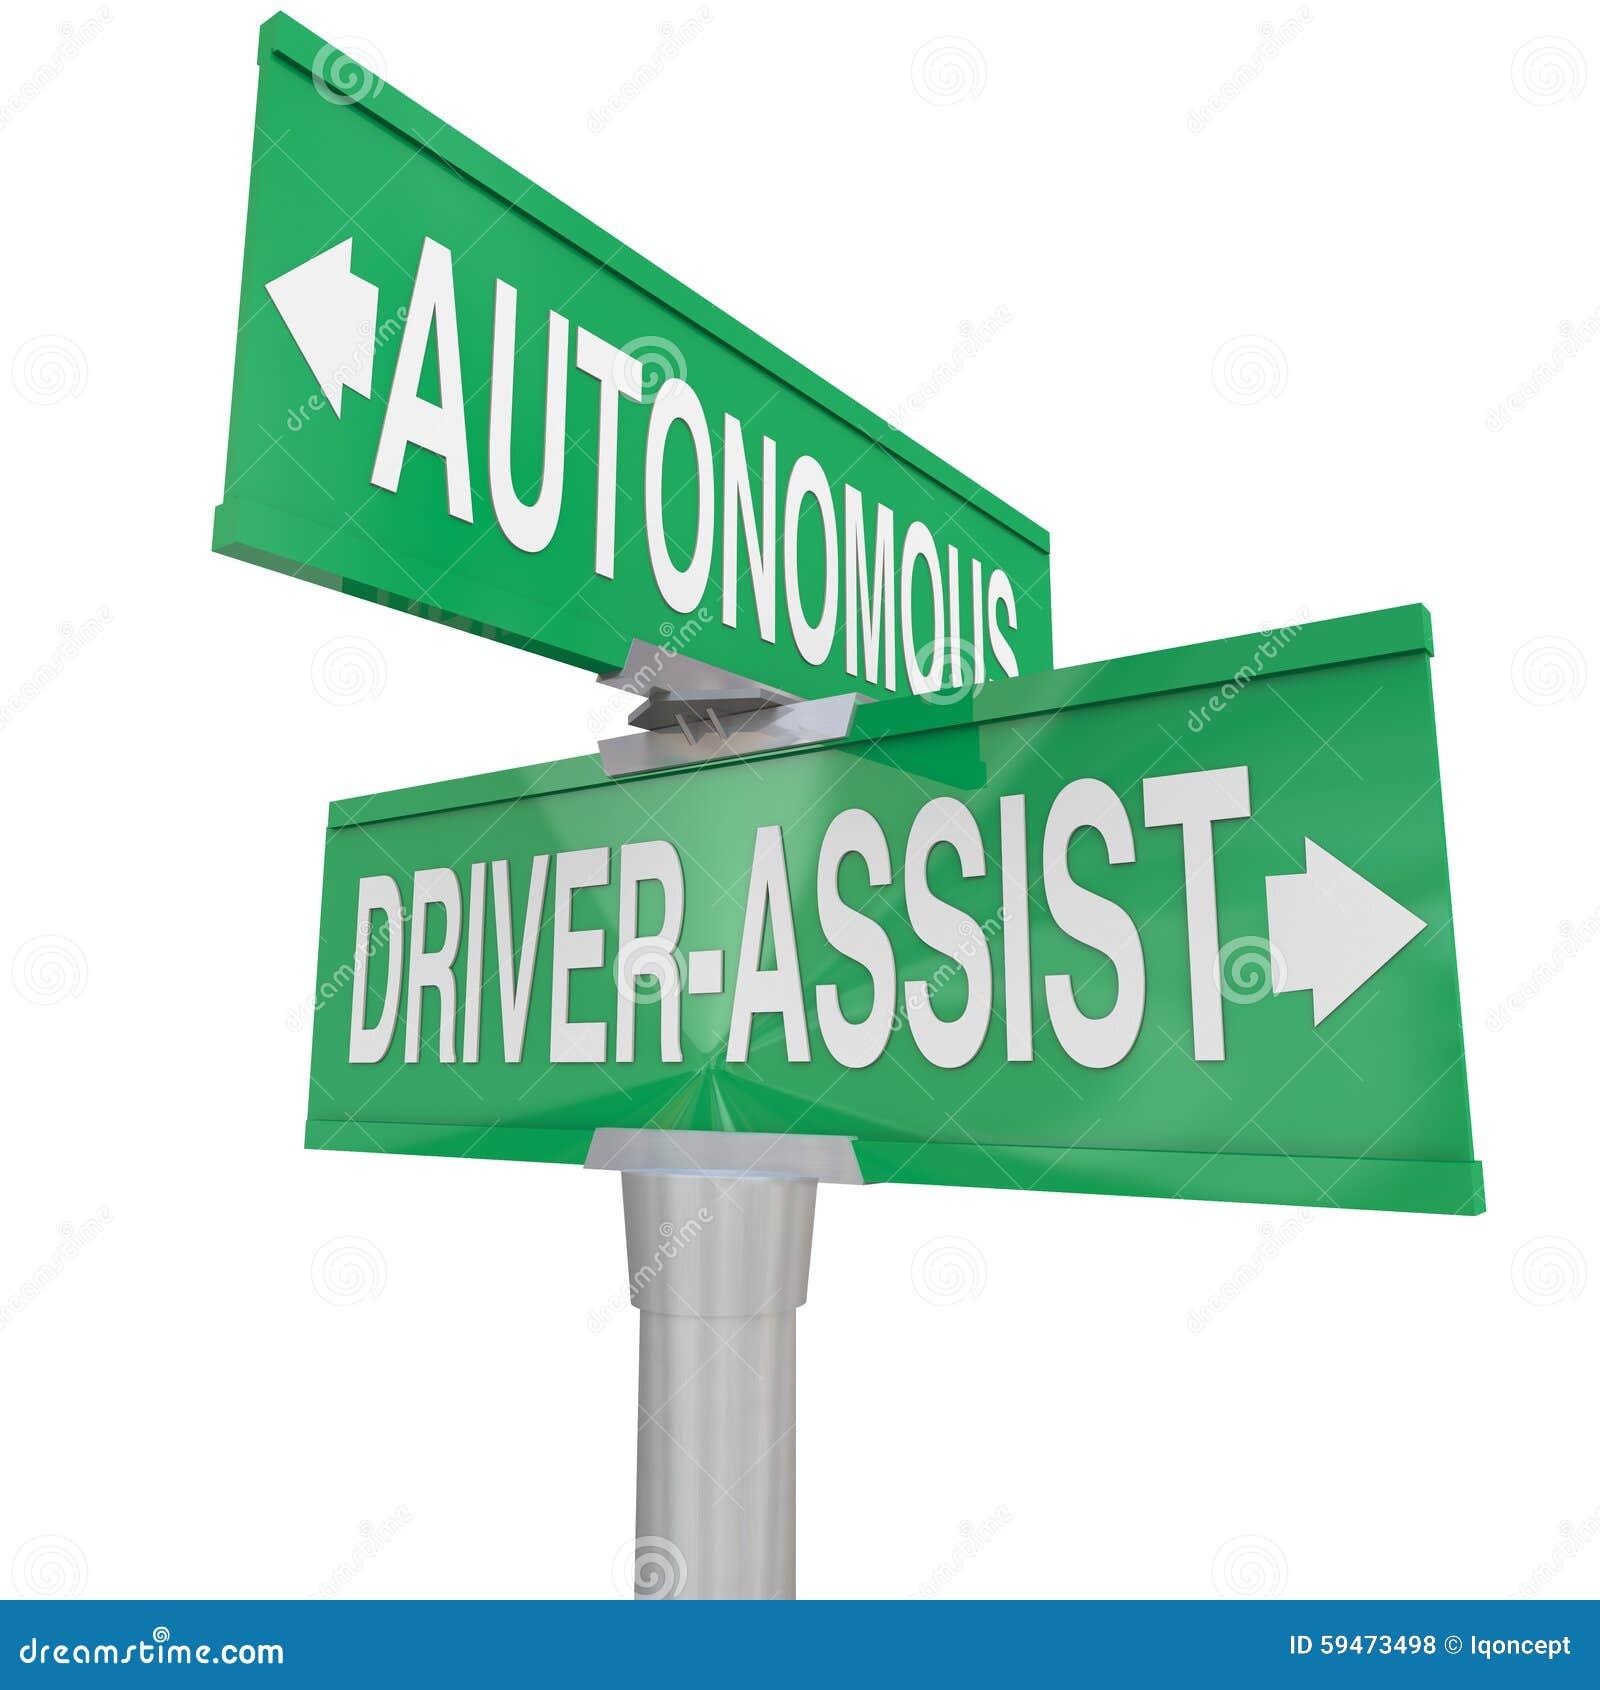 autonomous driving vs driver assist features technologies car ro stock illustration image. Black Bedroom Furniture Sets. Home Design Ideas